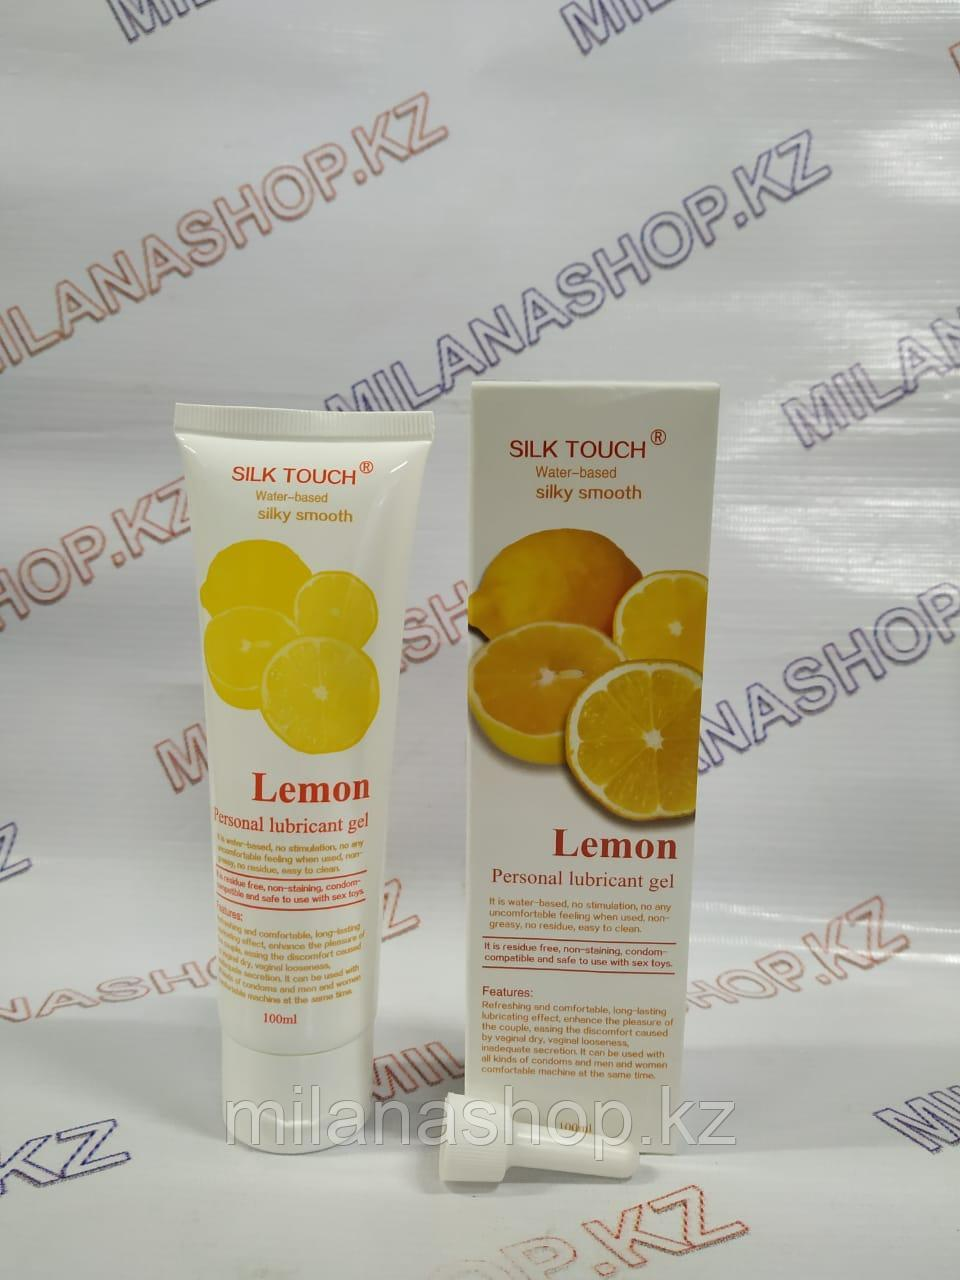 Смазка - Silk Touch - Лимон